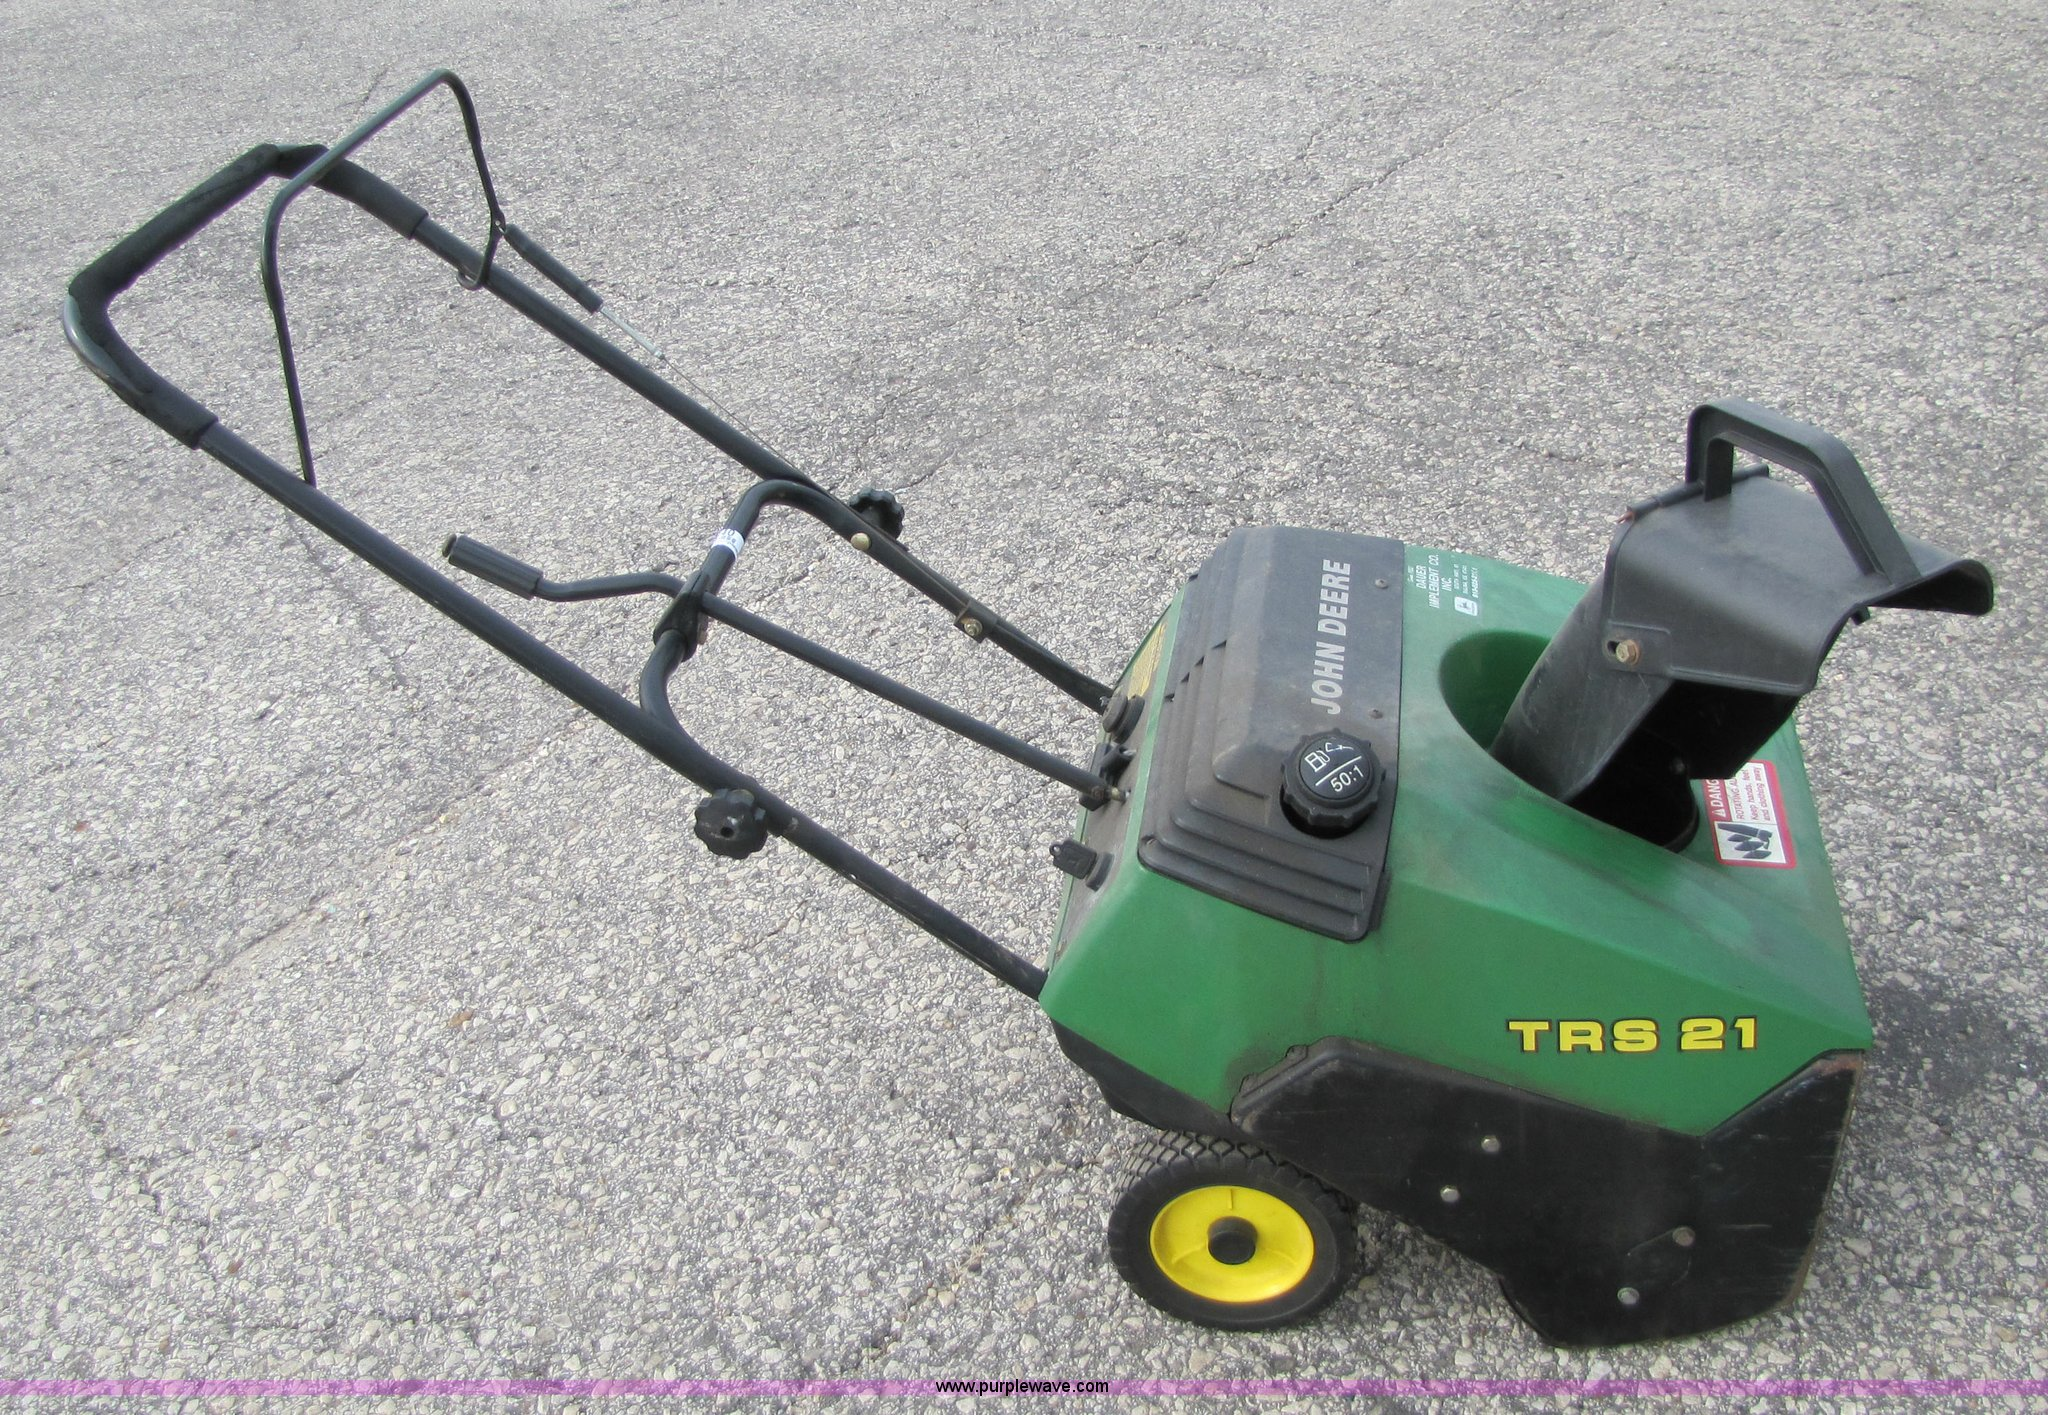 [SCHEMATICS_48IS]  John Deere TRS21 snow blower in Salina, KS | Item 5340 sold | Purple Wave | Trs21 Snowblower Parts Fuel Filter |  | Purple Wave